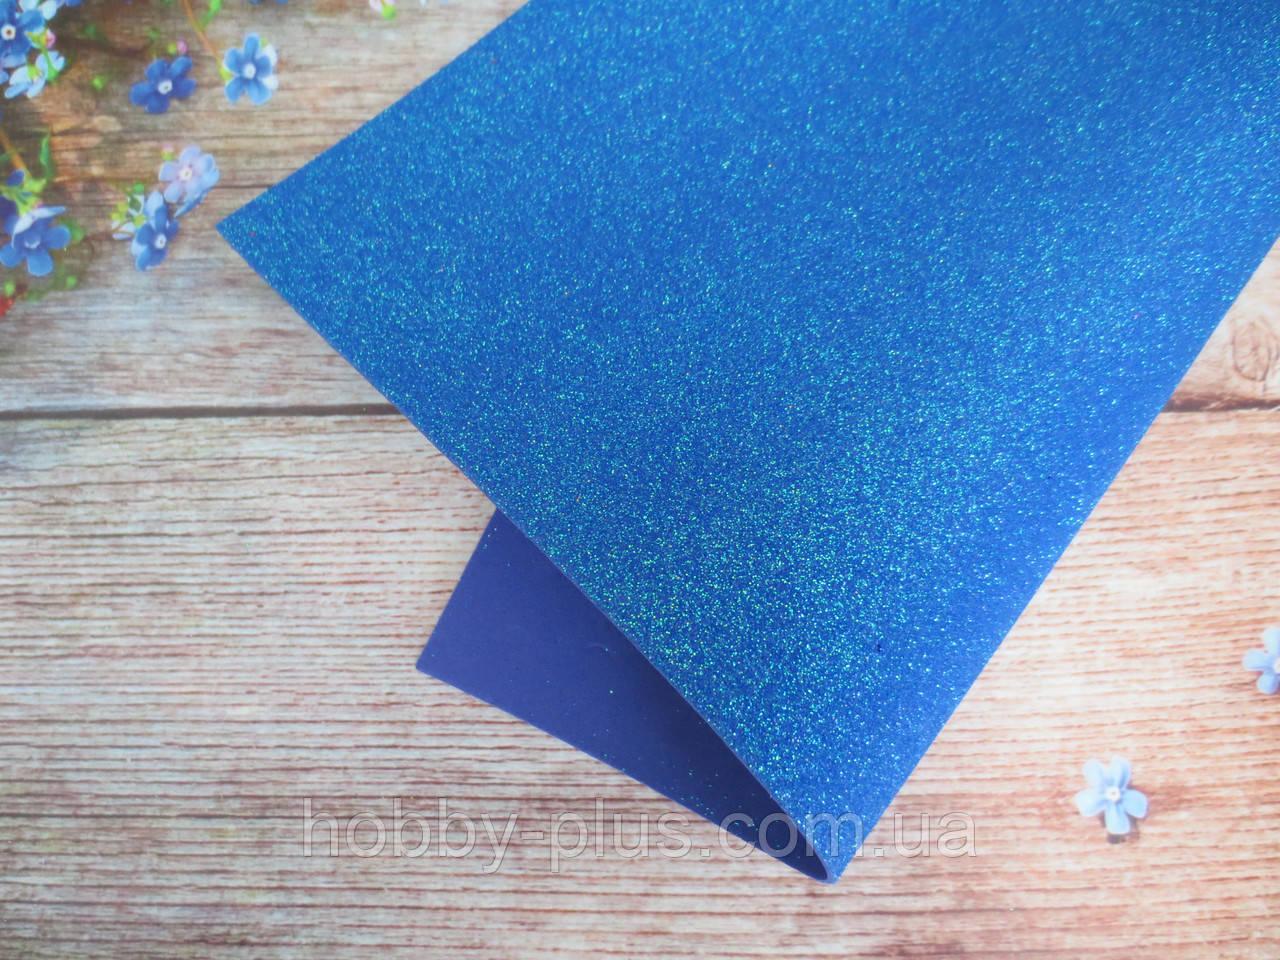 Фоамиран глиттерный 1,6 мм, 20x30 см, Китай, СИНИЙ с переливом